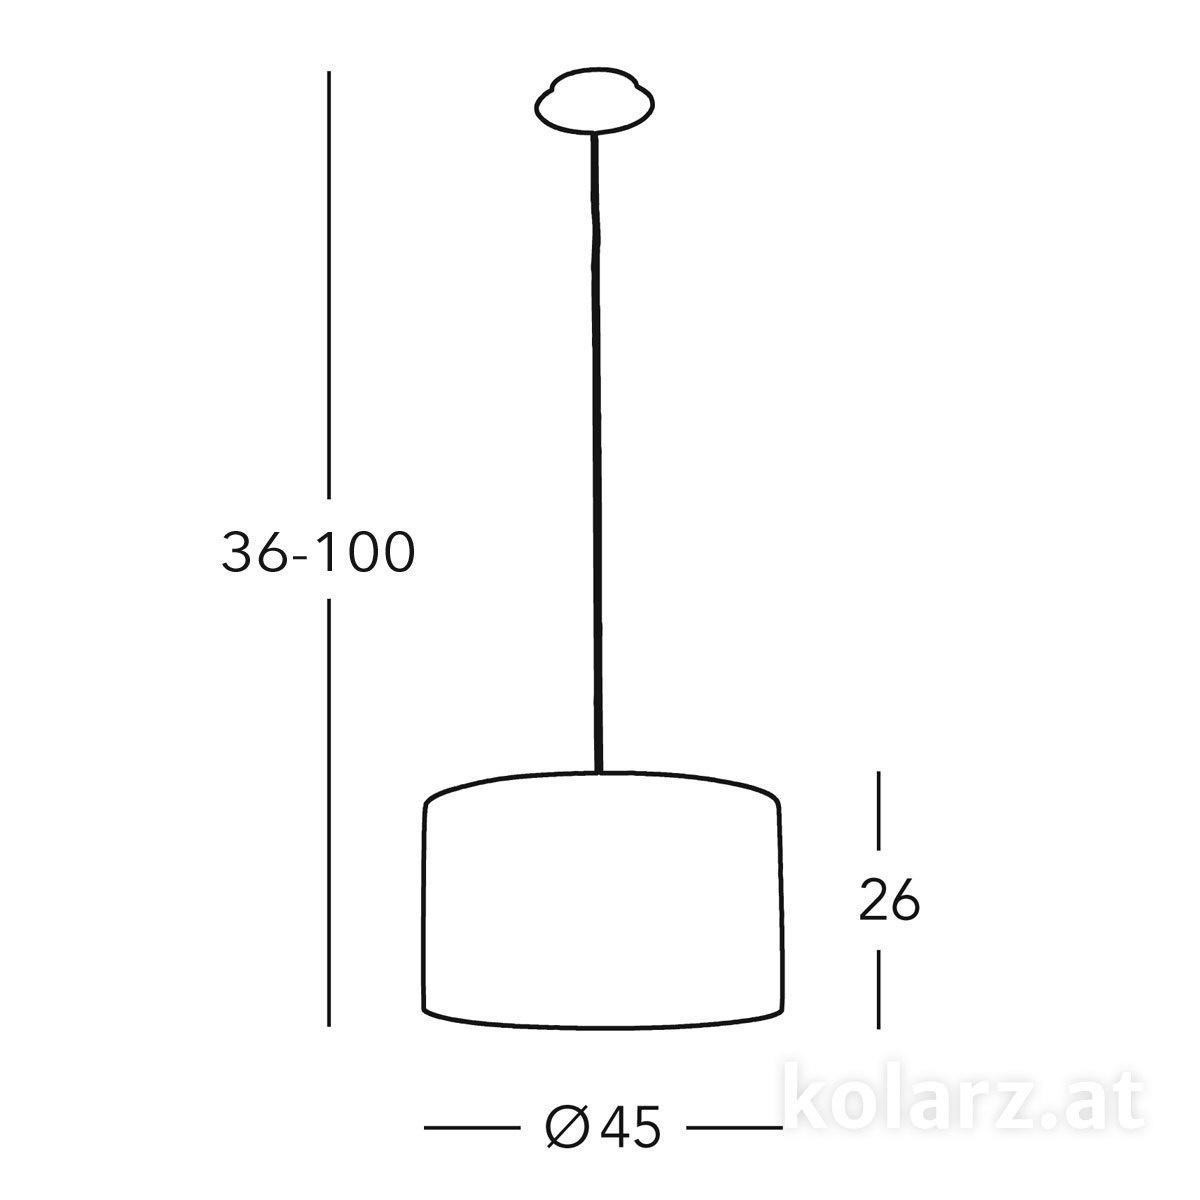 A1307-33R-7-s1.jpg